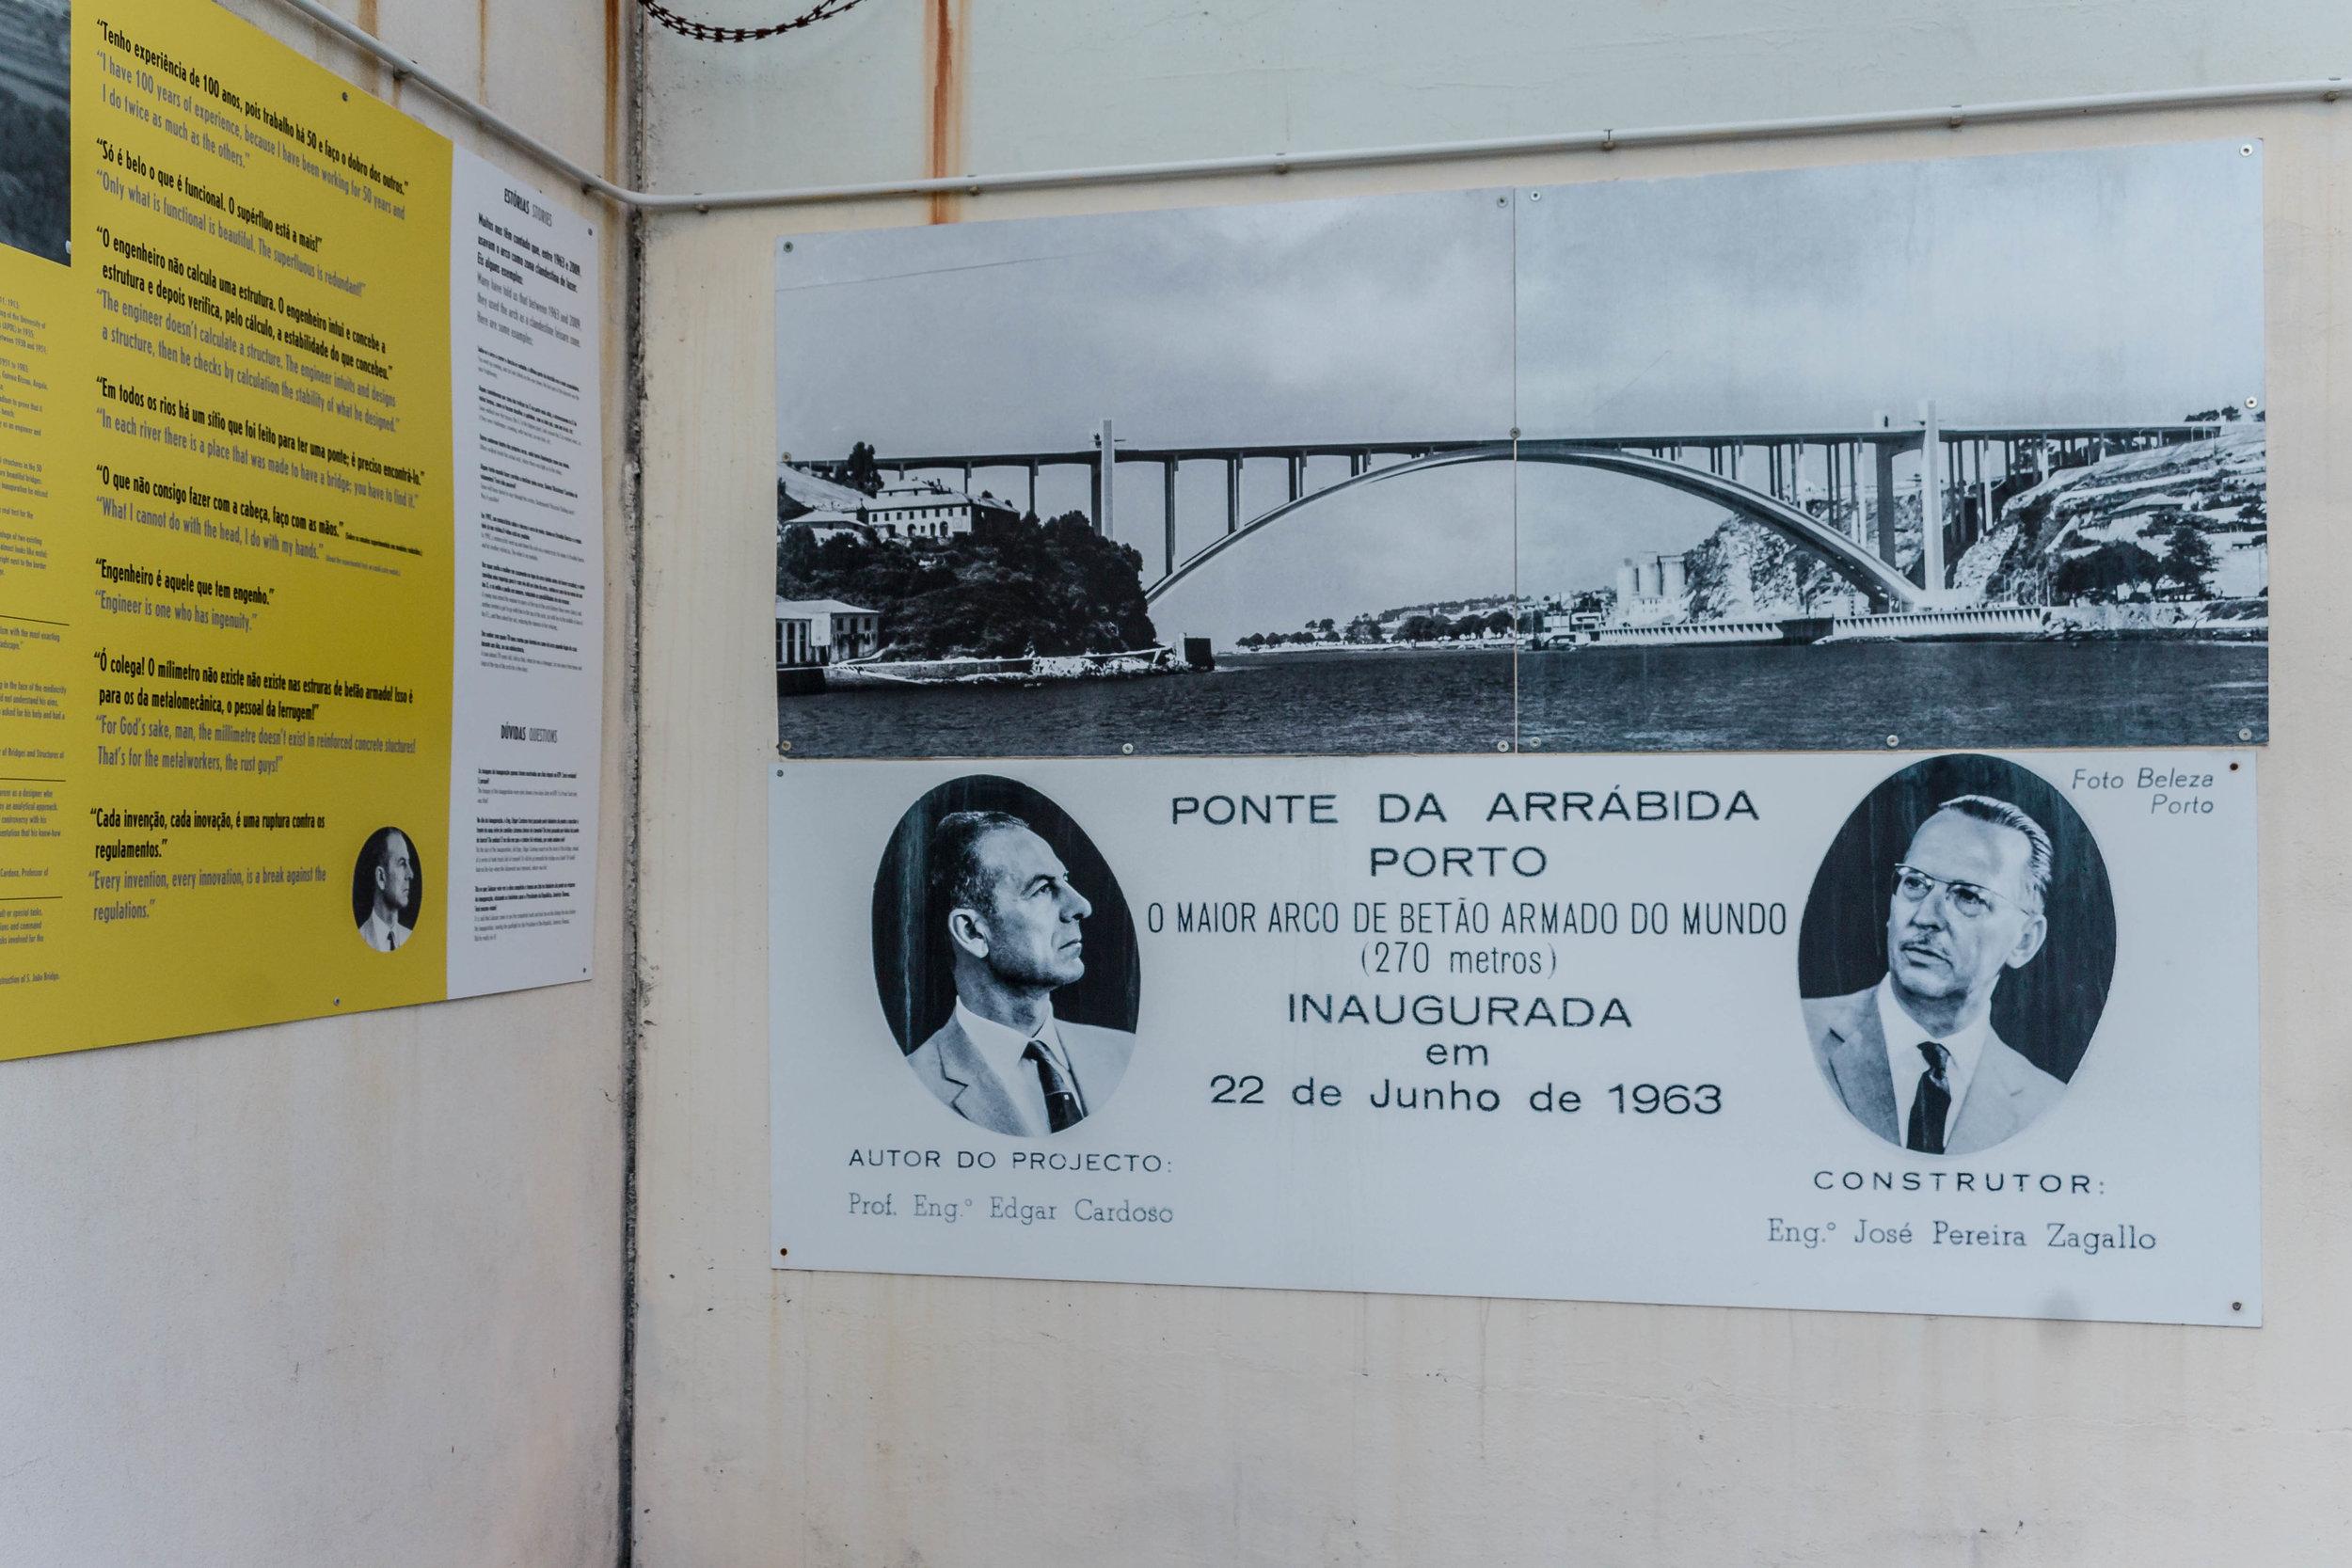 The Porto Bridge Climb takes place over Arrábida Bridge on the Western side of Porto.